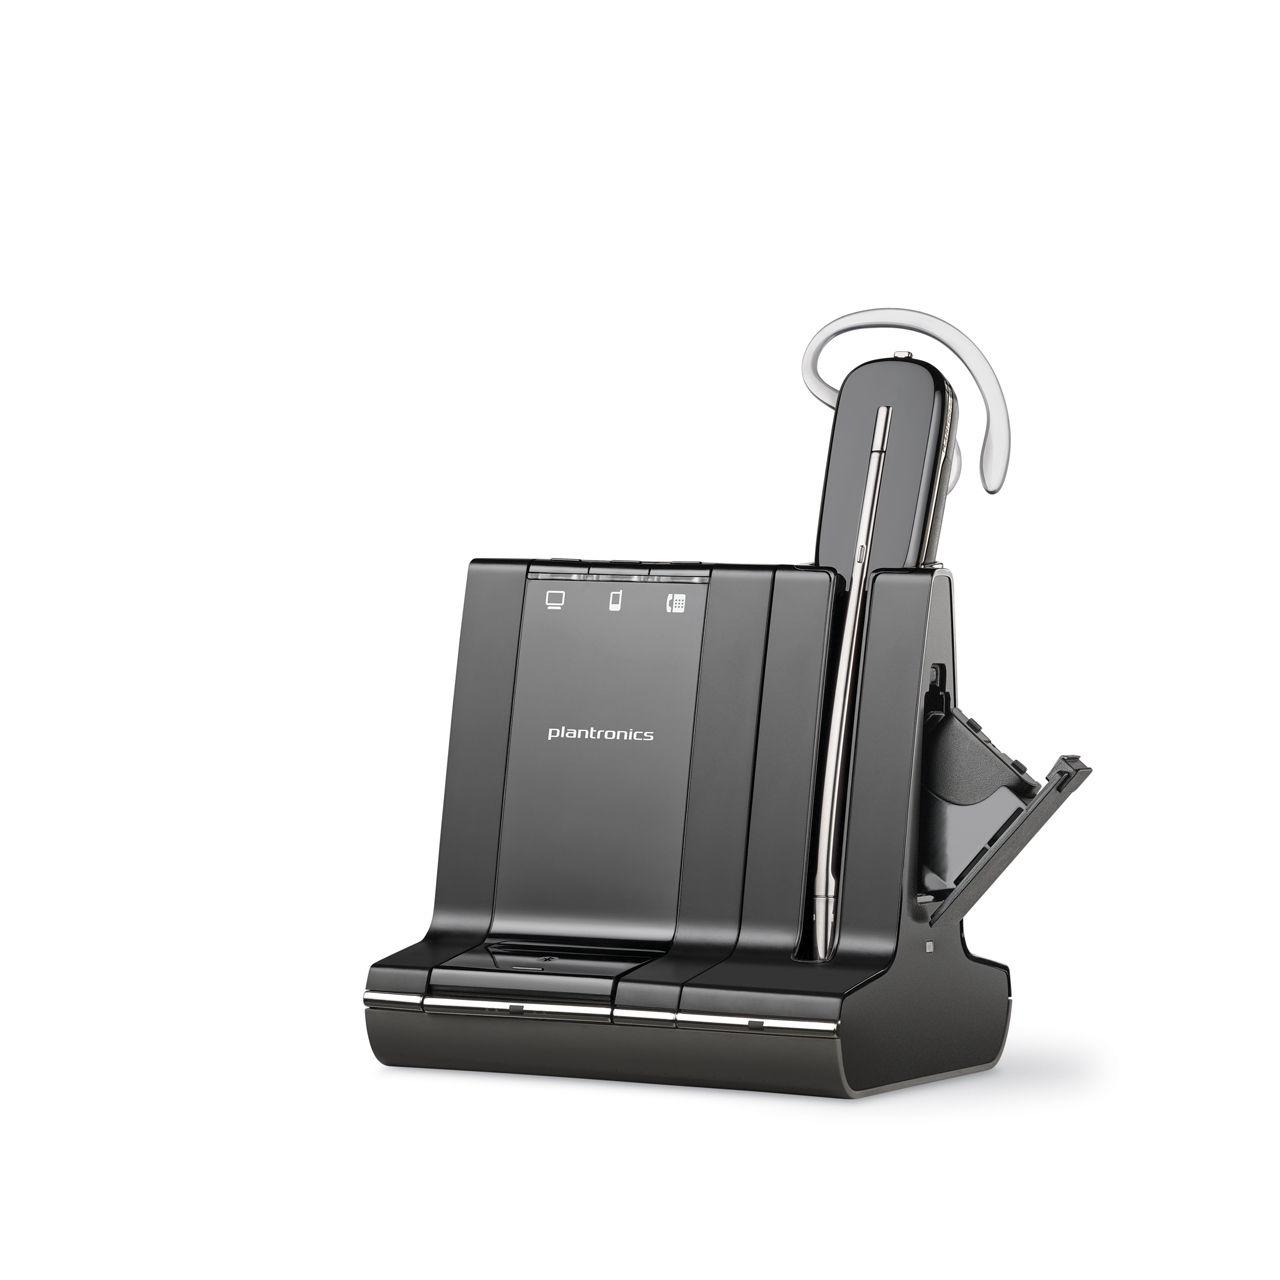 Plantronics Savi W745 headset